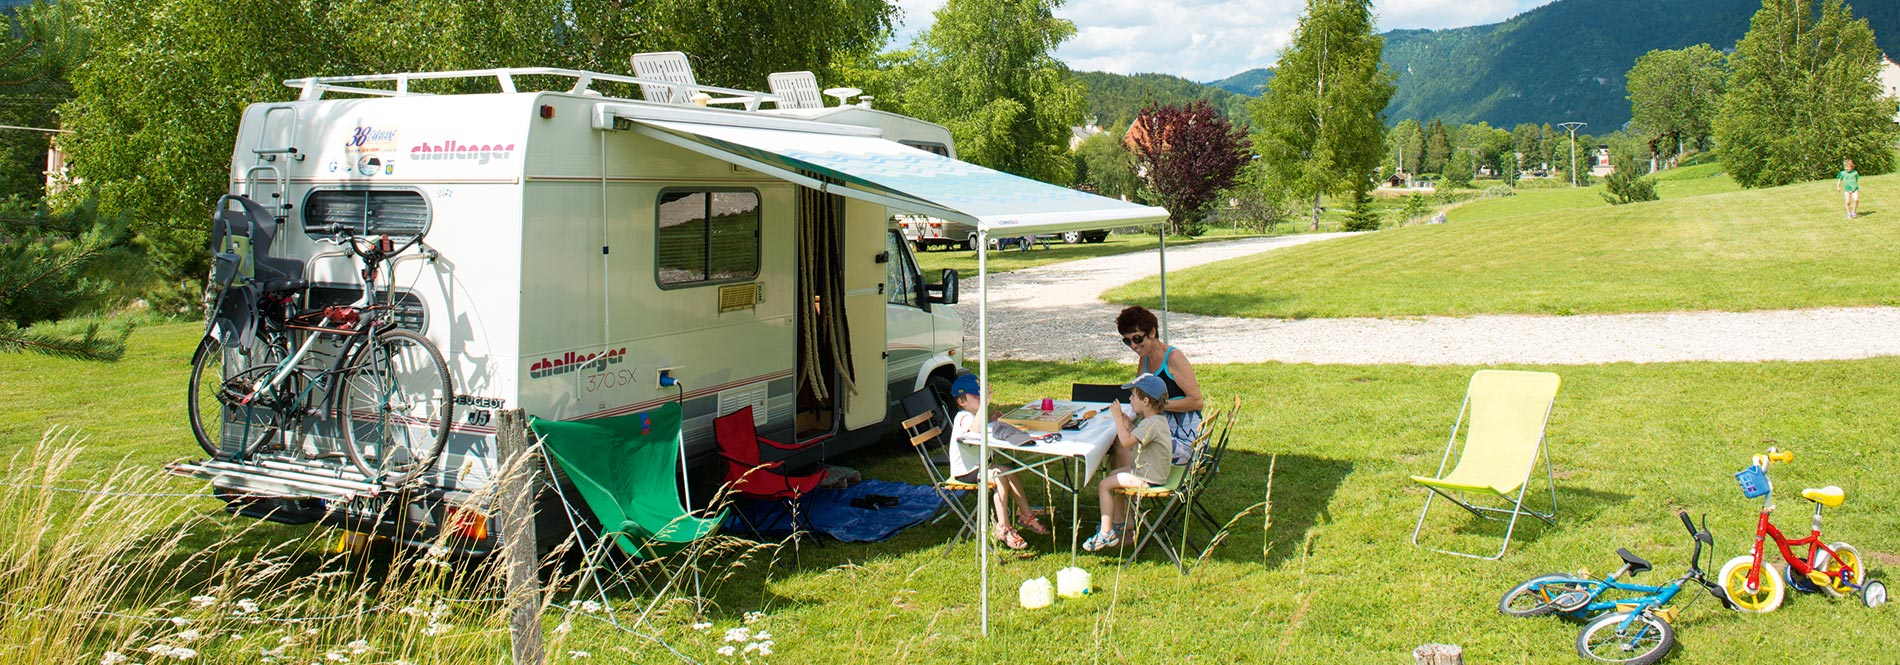 camping caravane nos locations d 39 emplacements en camping tentes camping car. Black Bedroom Furniture Sets. Home Design Ideas